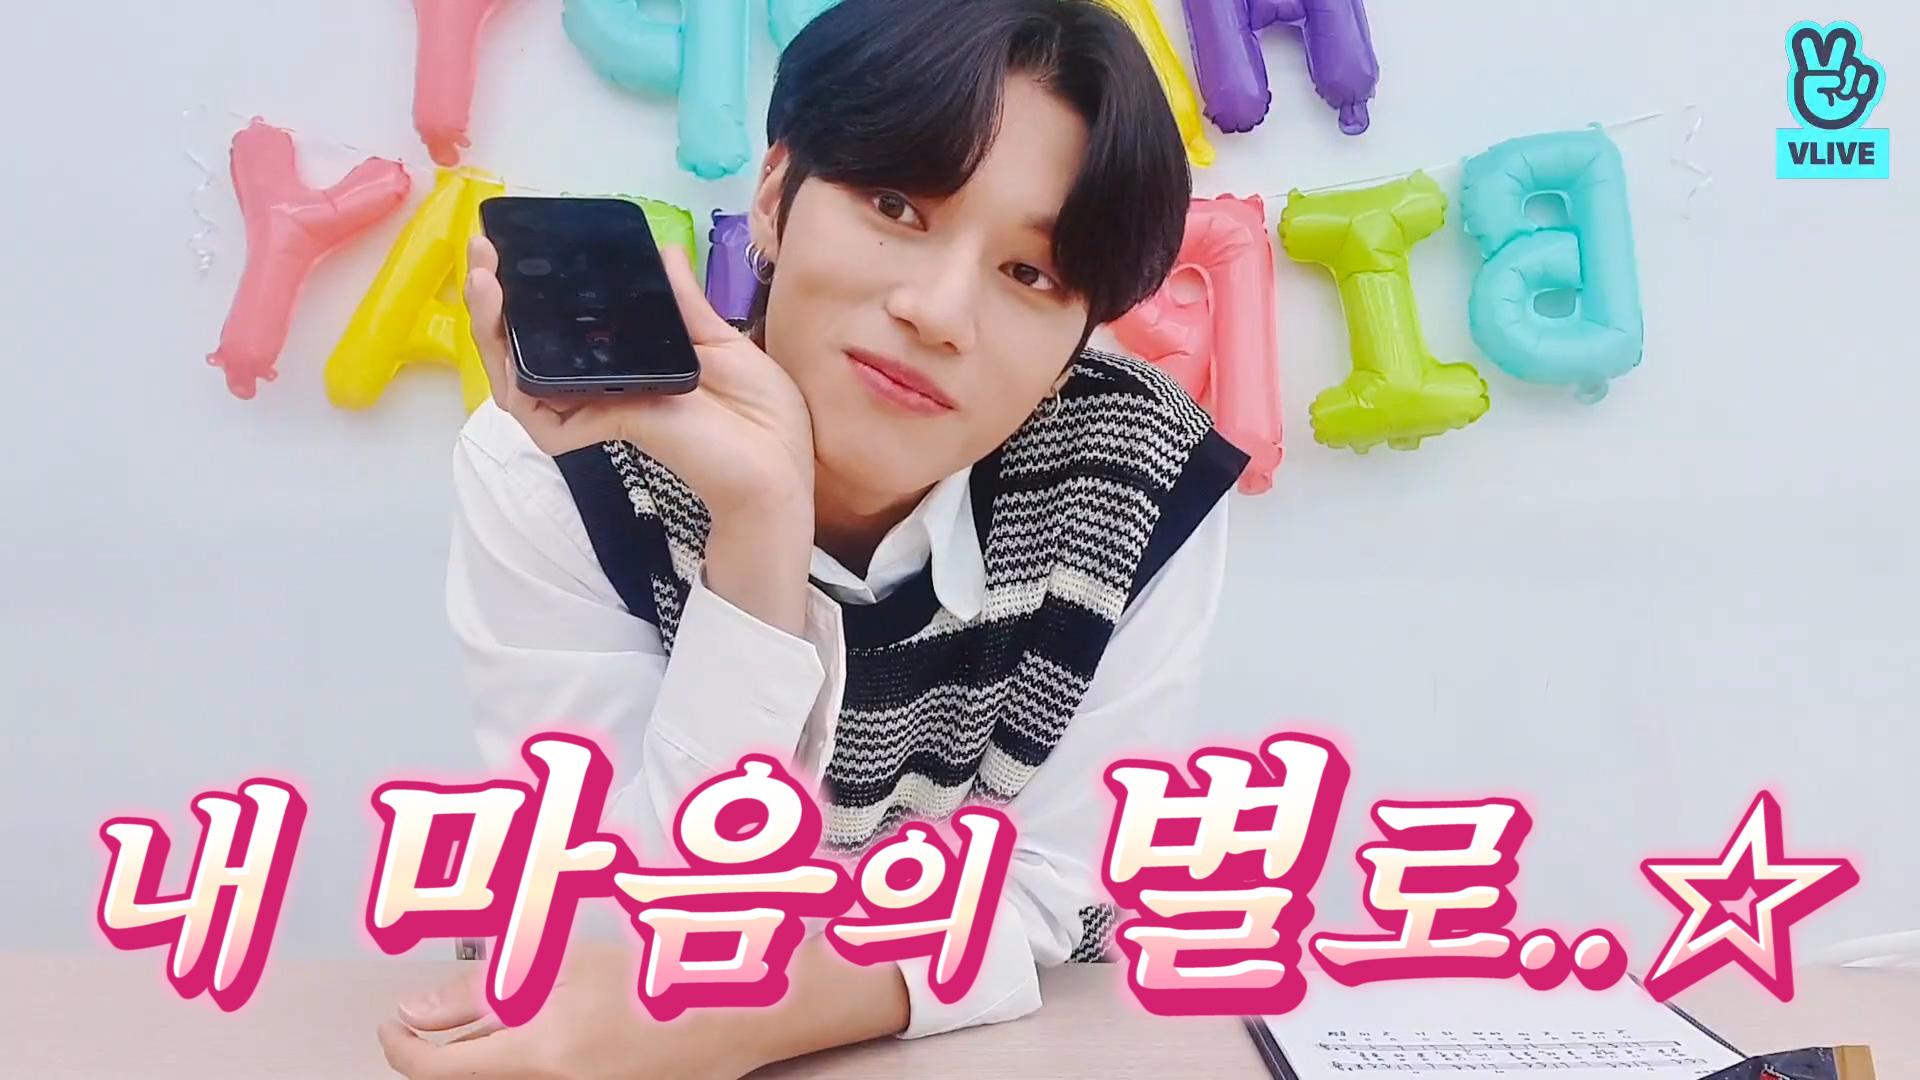 [ATEEZ] 우리 우영이 태어나줘서 감사.. 압도적 감사❣️ (WOOYOUNG calling with members on his birthday)